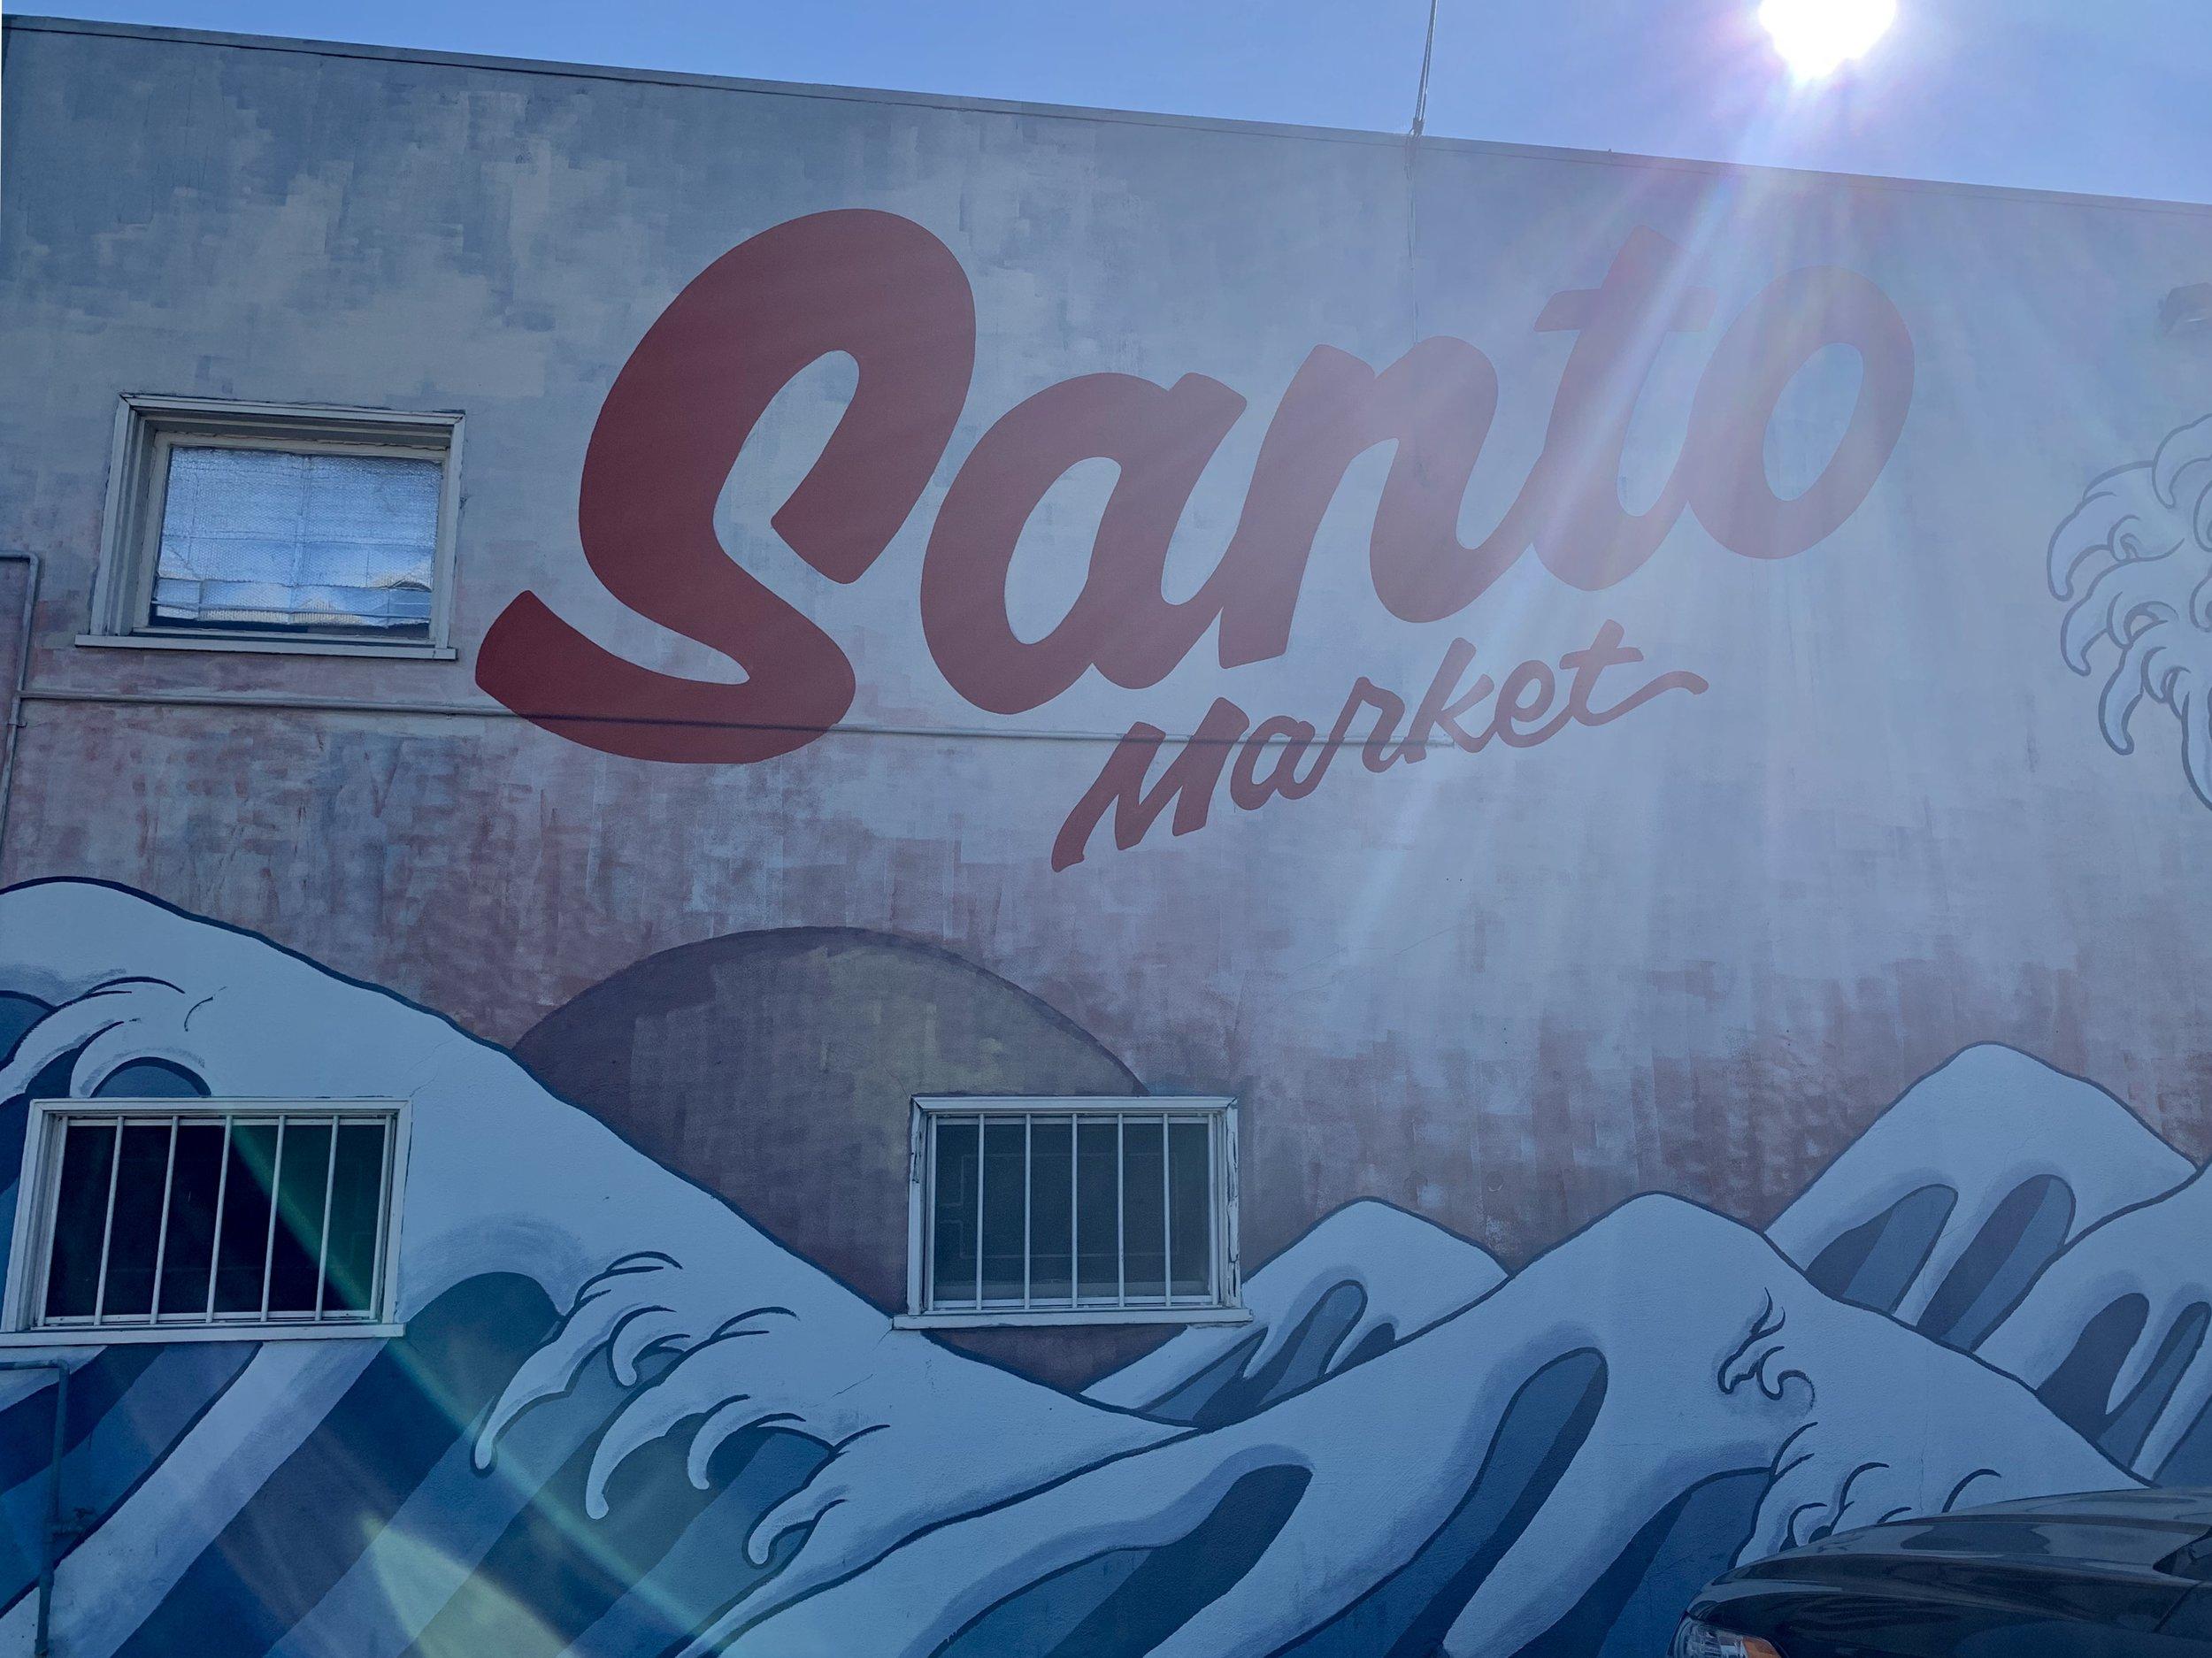 The Santo Market in 2019